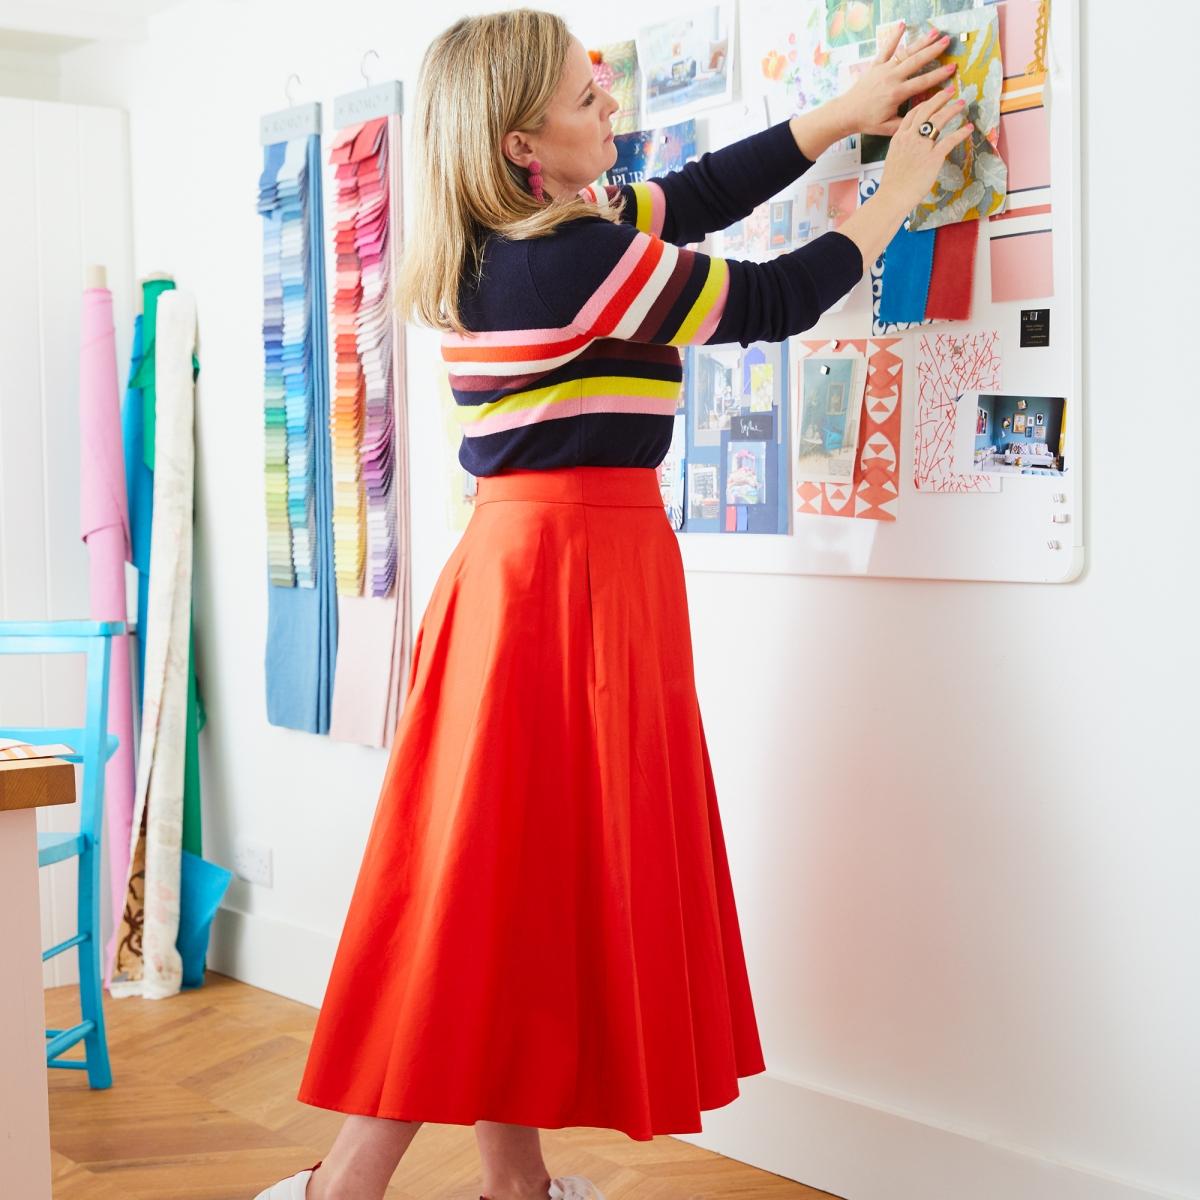 Interior Design Homeoffice: Home Sophie Robinson